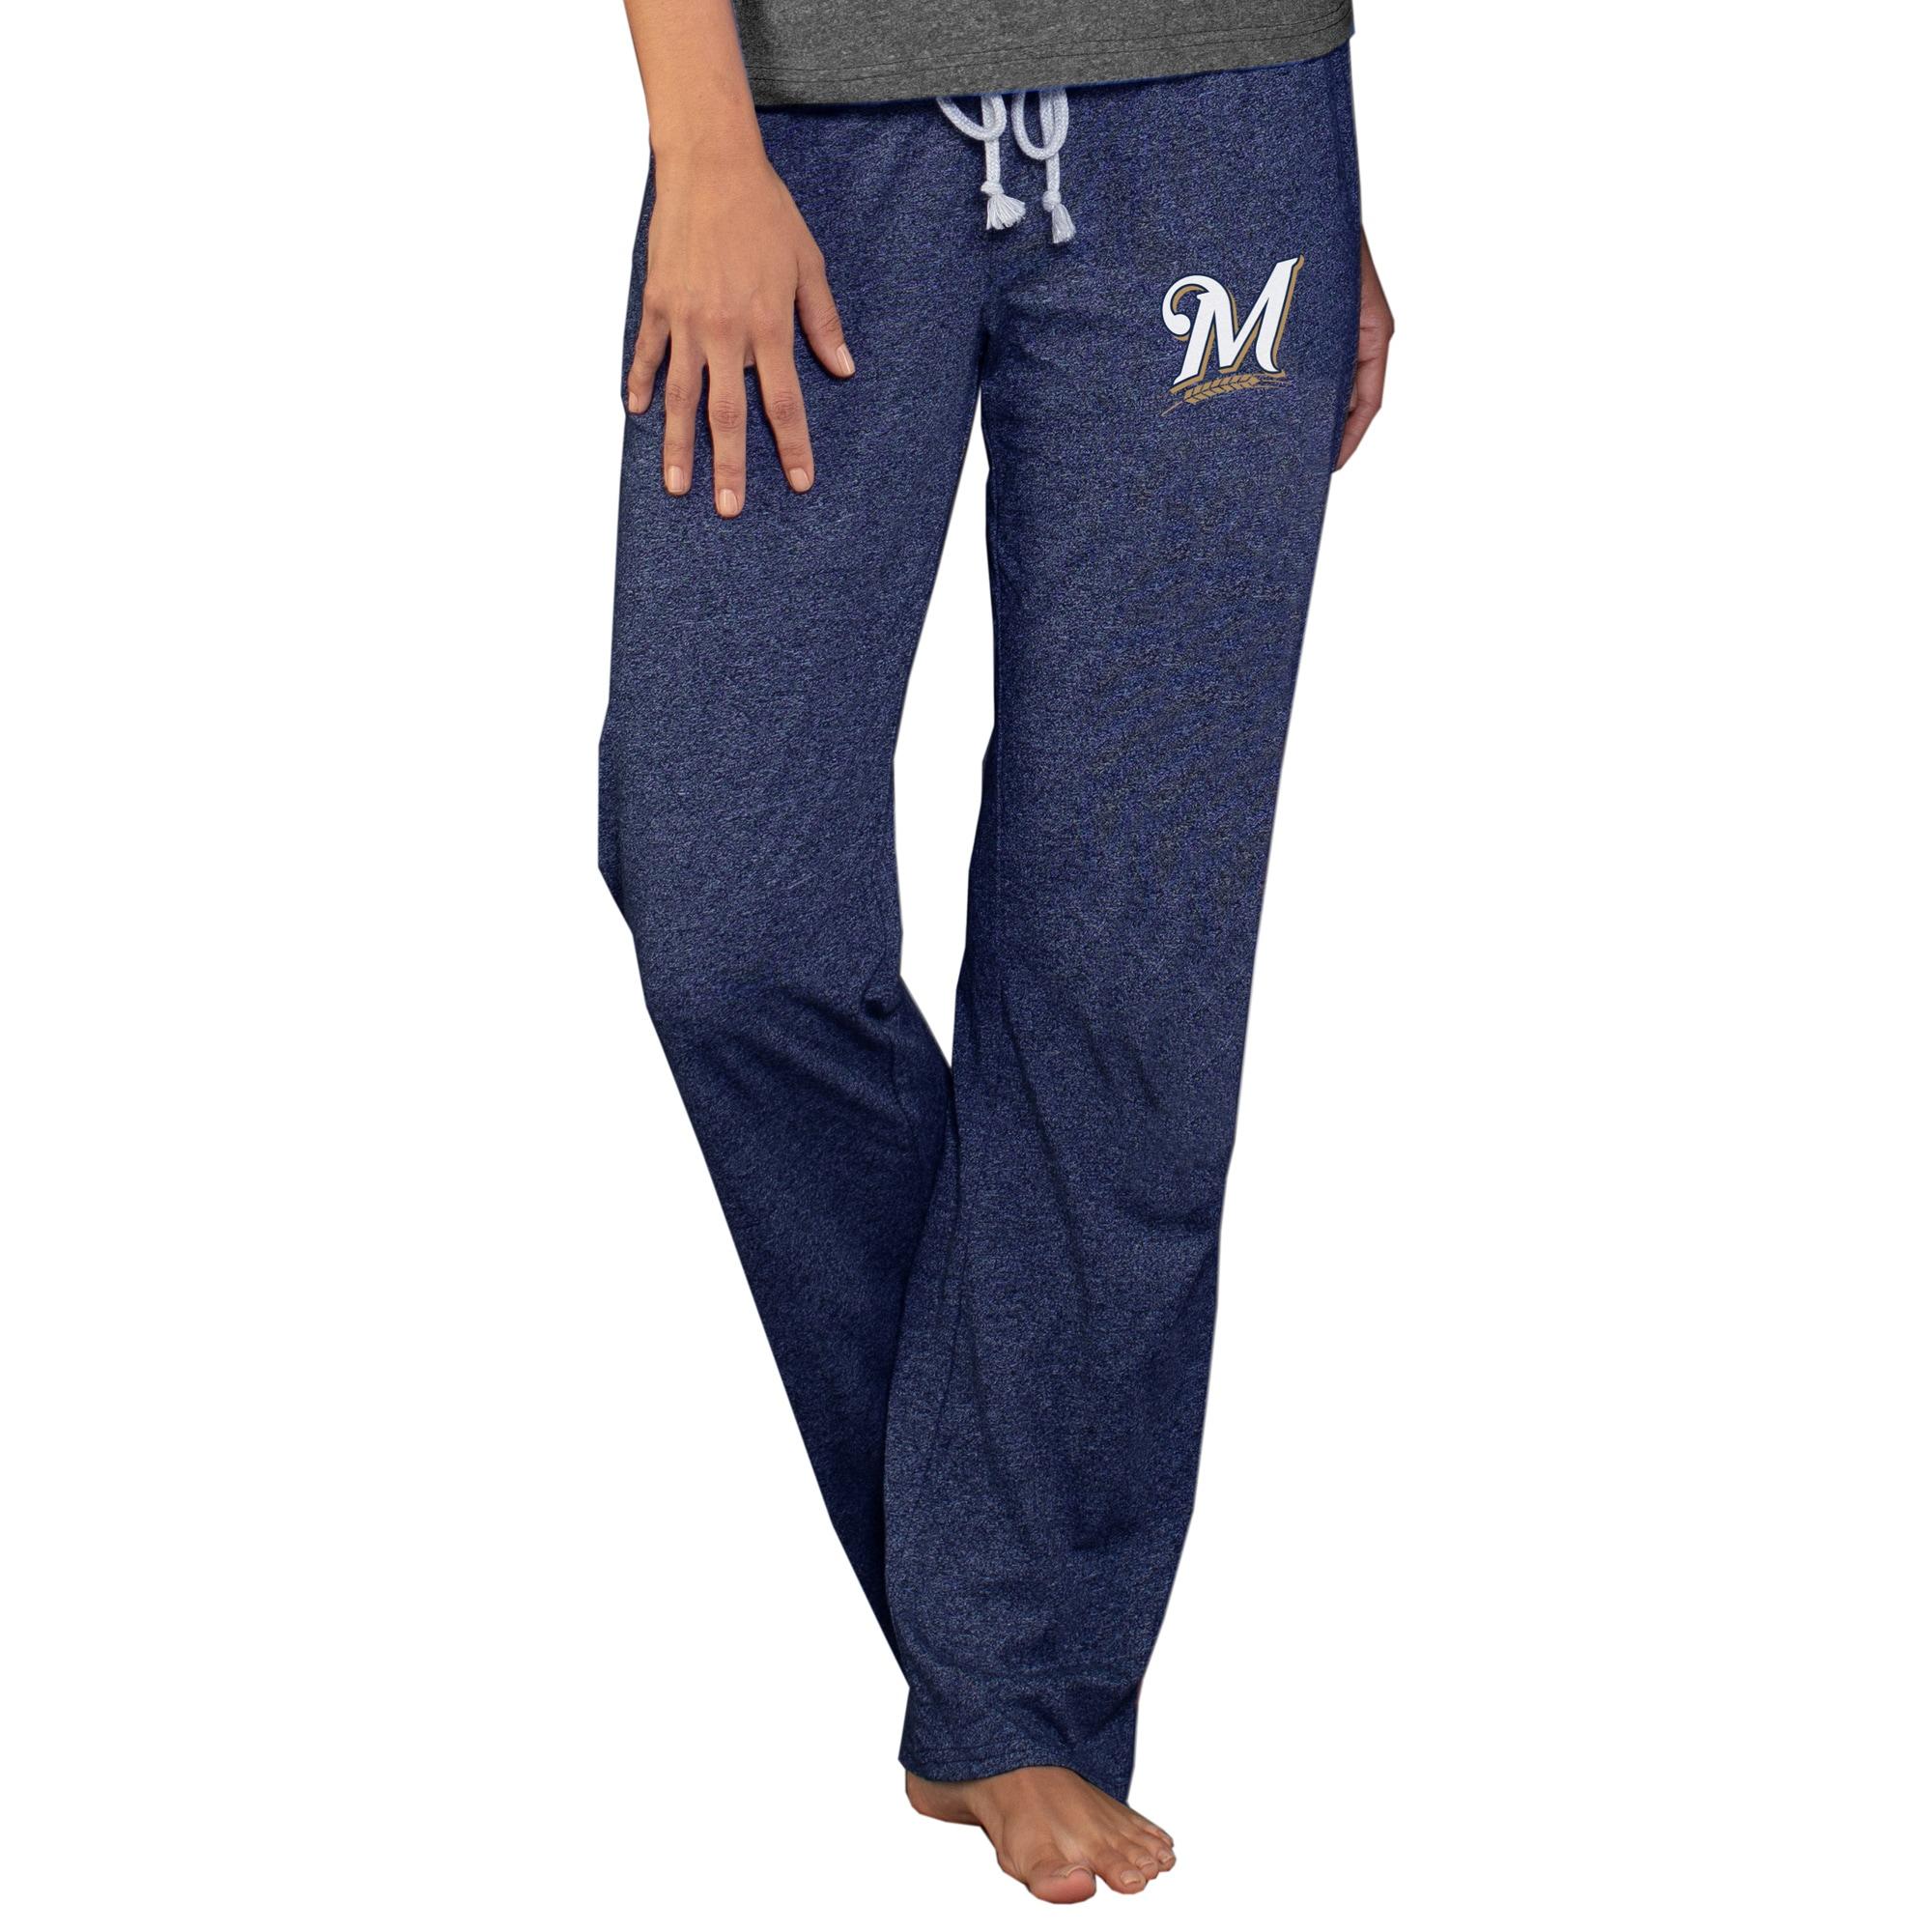 Milwaukee Brewers Concepts Sport Women's Quest Knit Pants - Navy